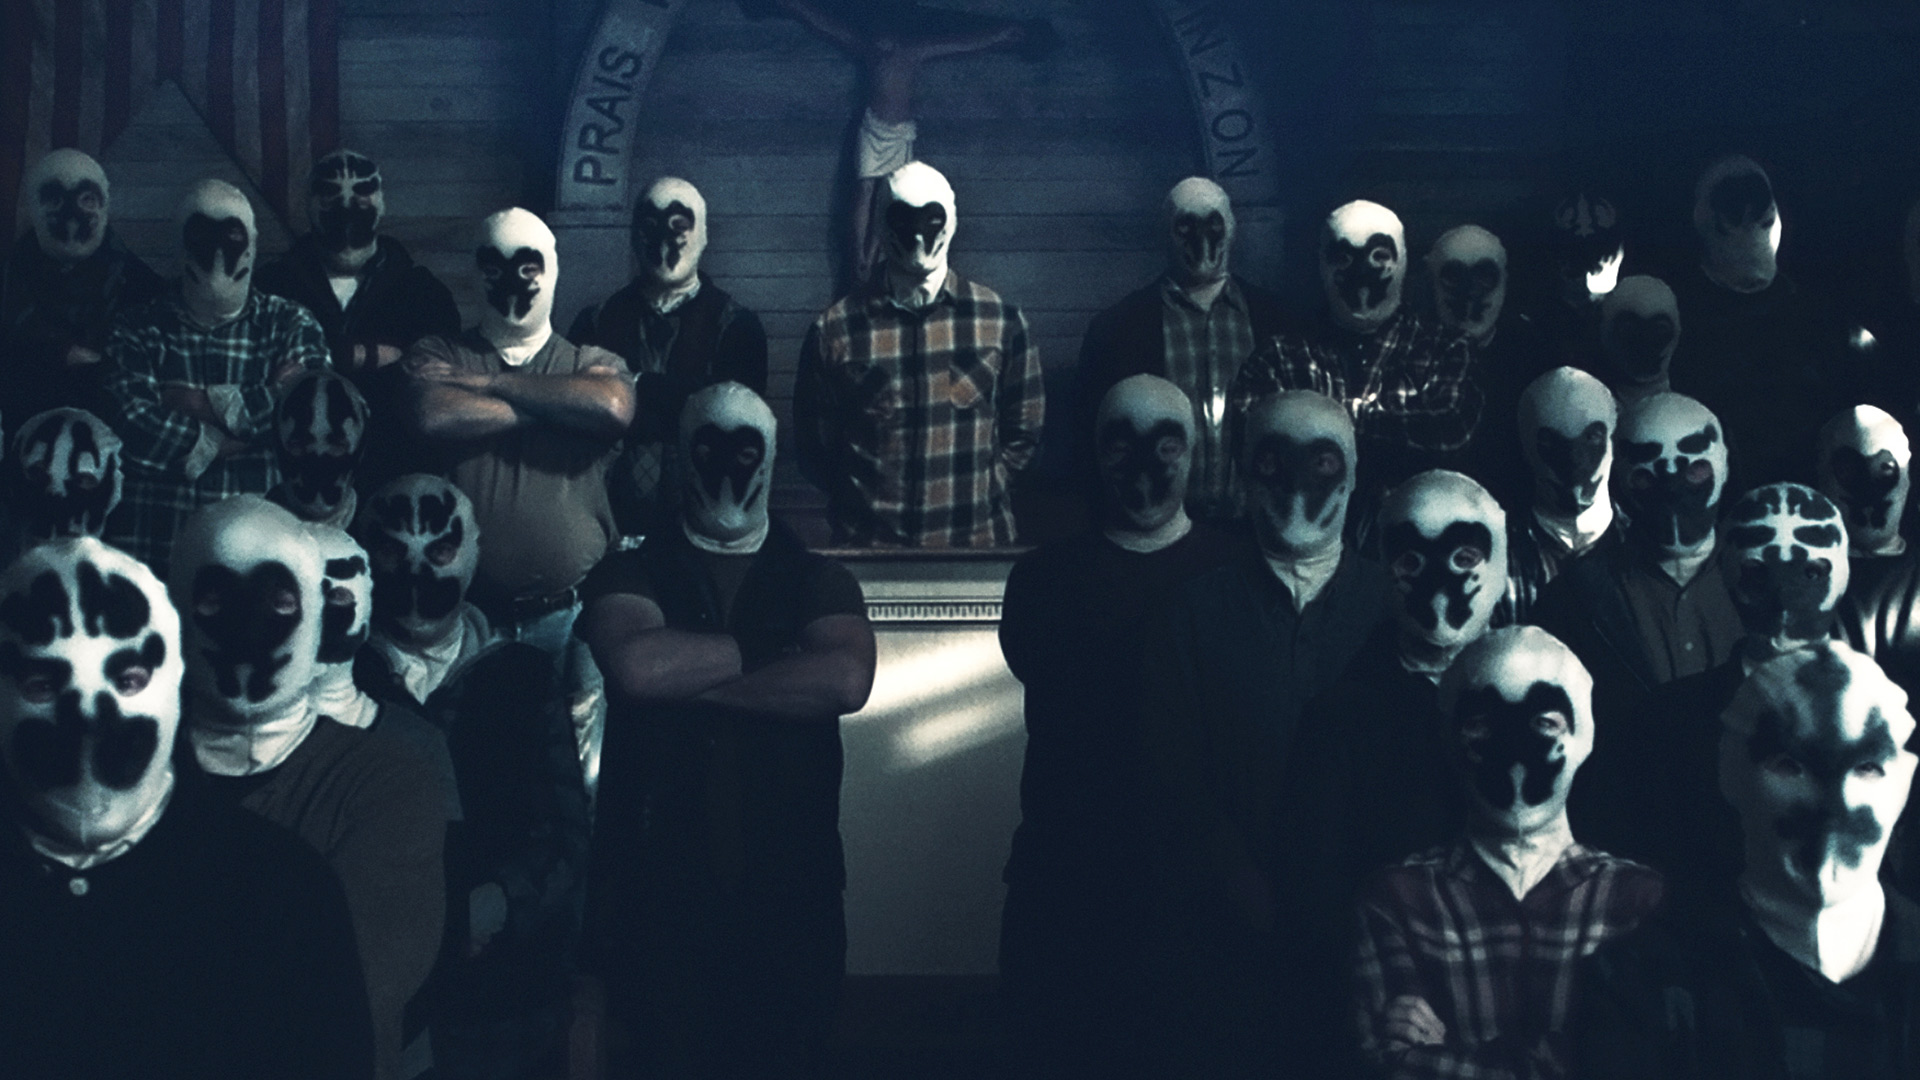 HBO Drama Series Watchmen debuts in October